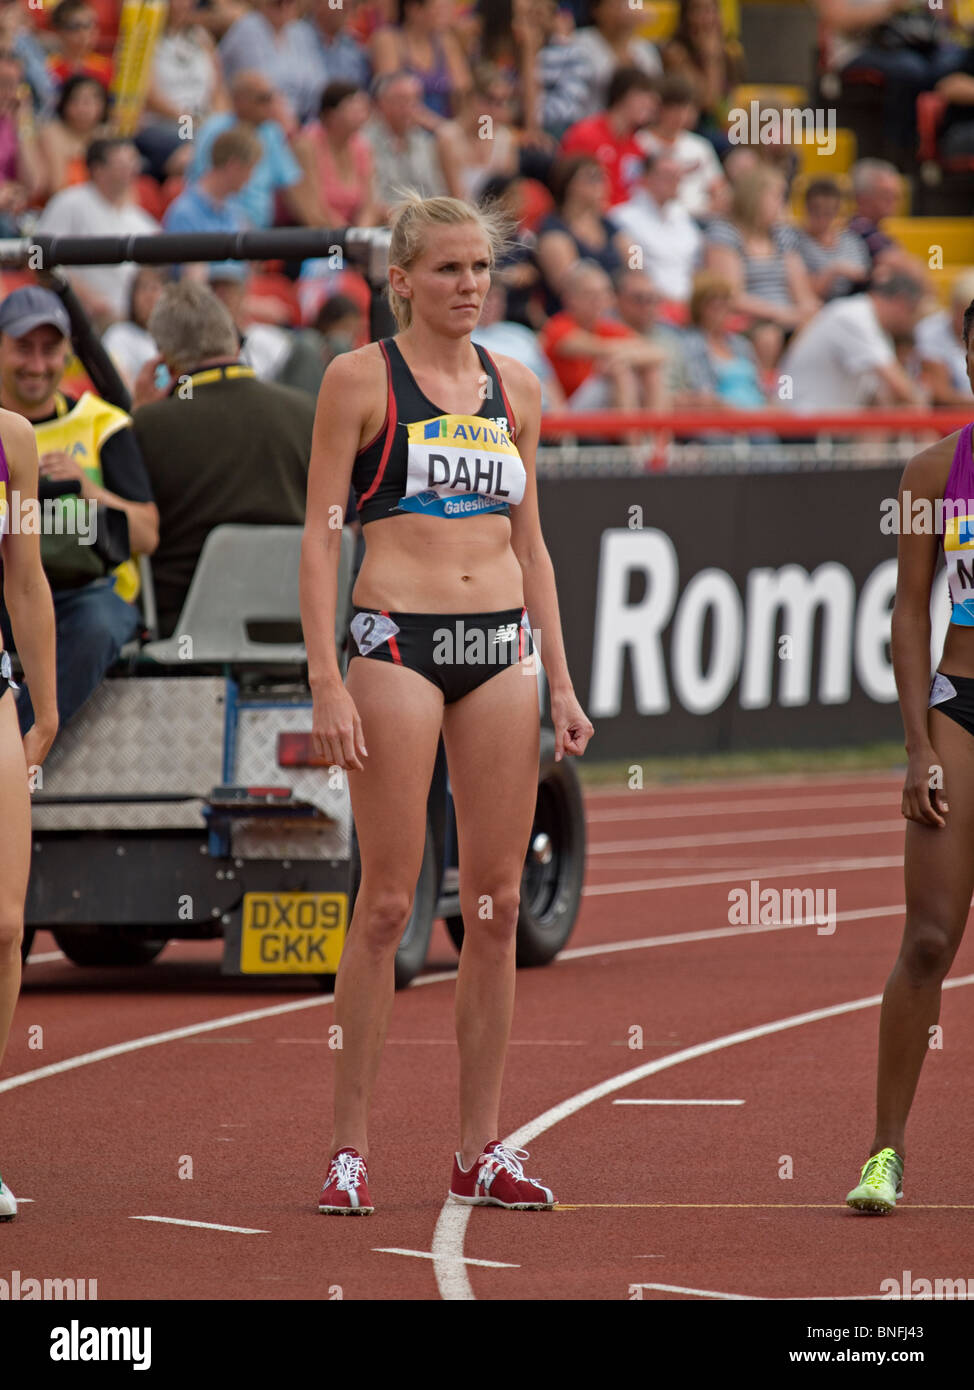 Heidi Dahl preparing for womens 1500meters in IAAF Diamond League in Gateshead 2010 - Stock Image